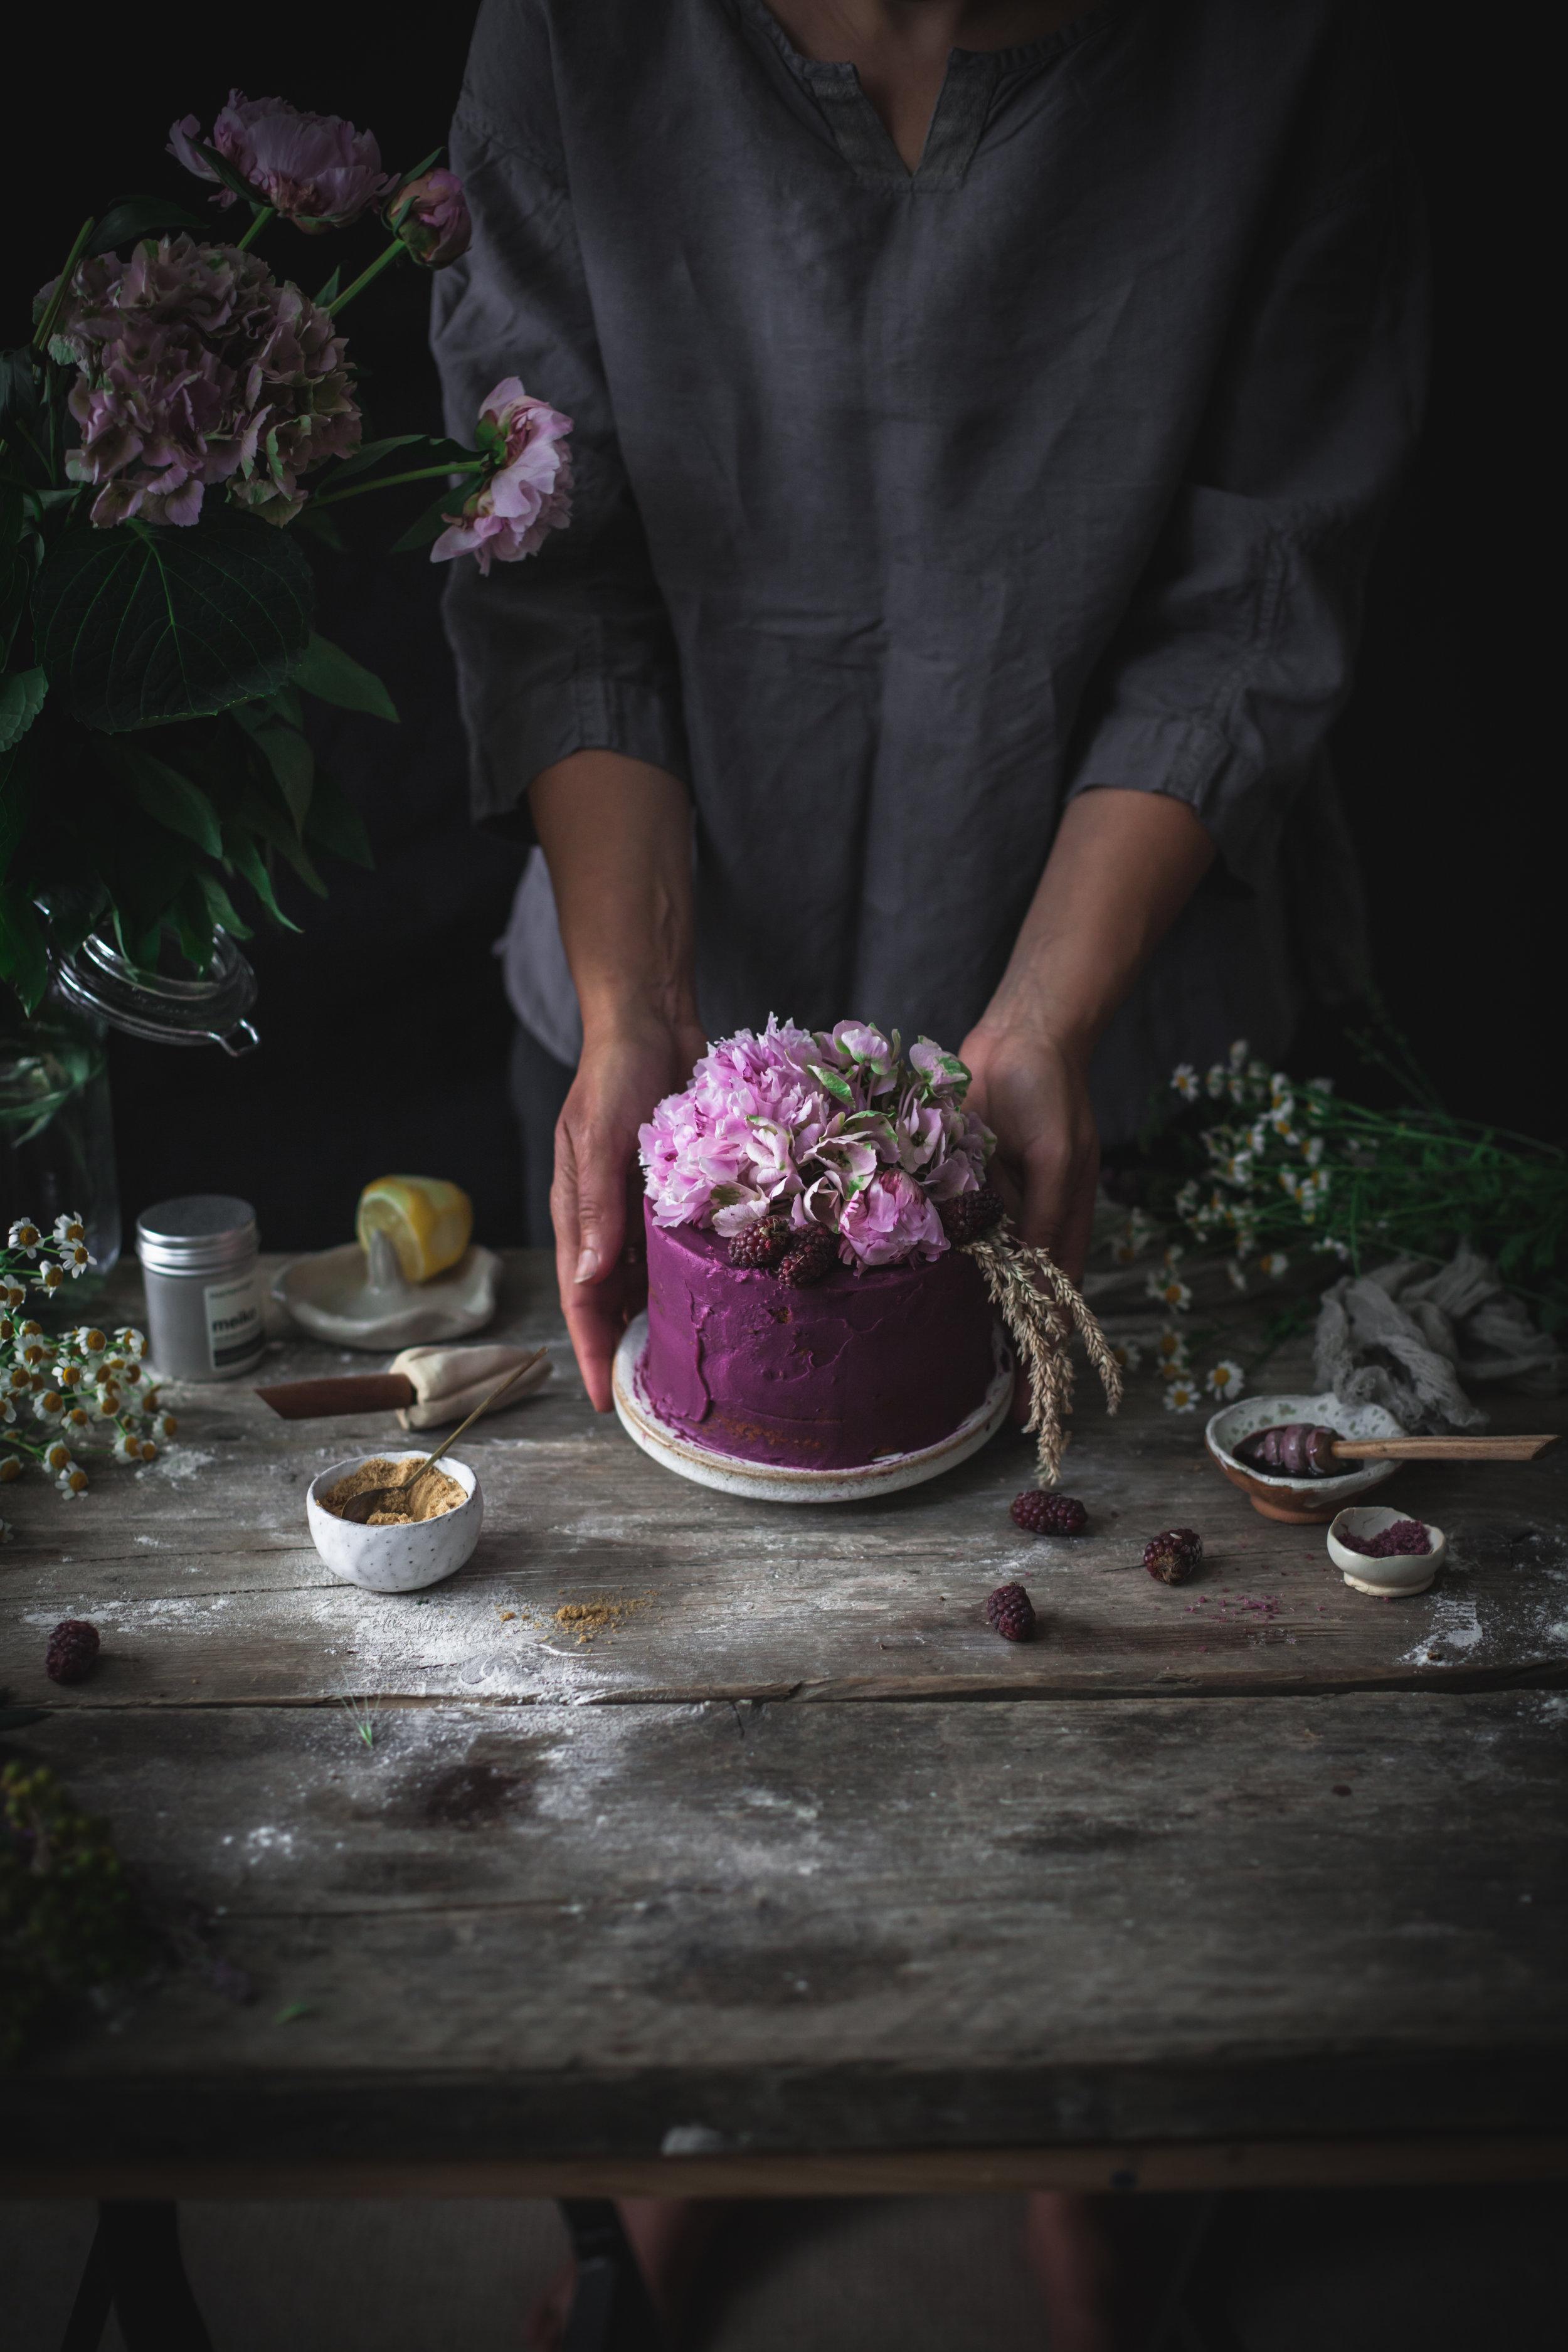 purple potates and white chocolate vegan cake